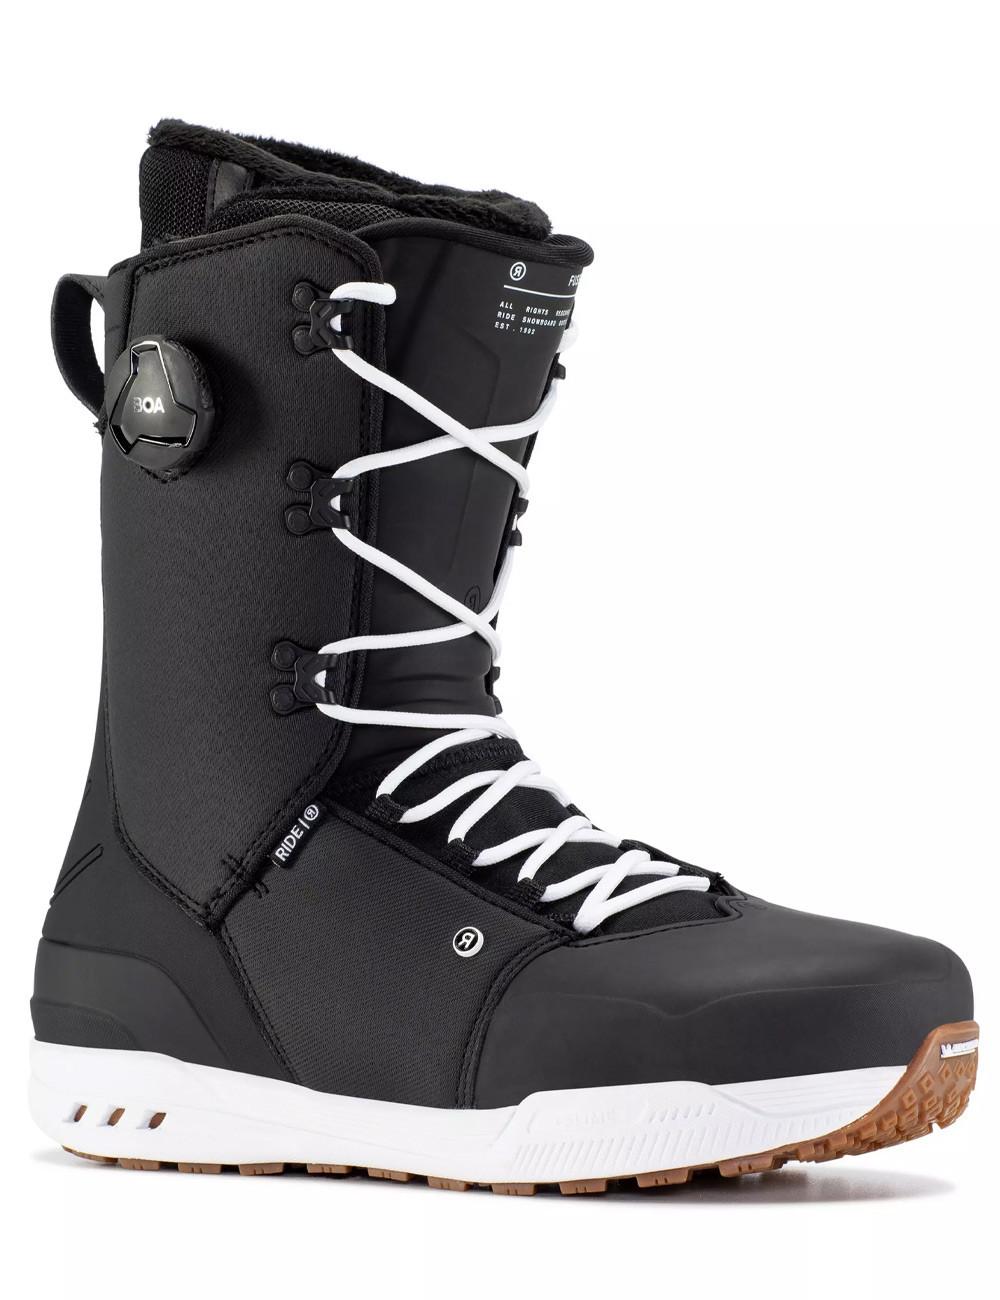 Buty snowboardowe Ride Fuse Black